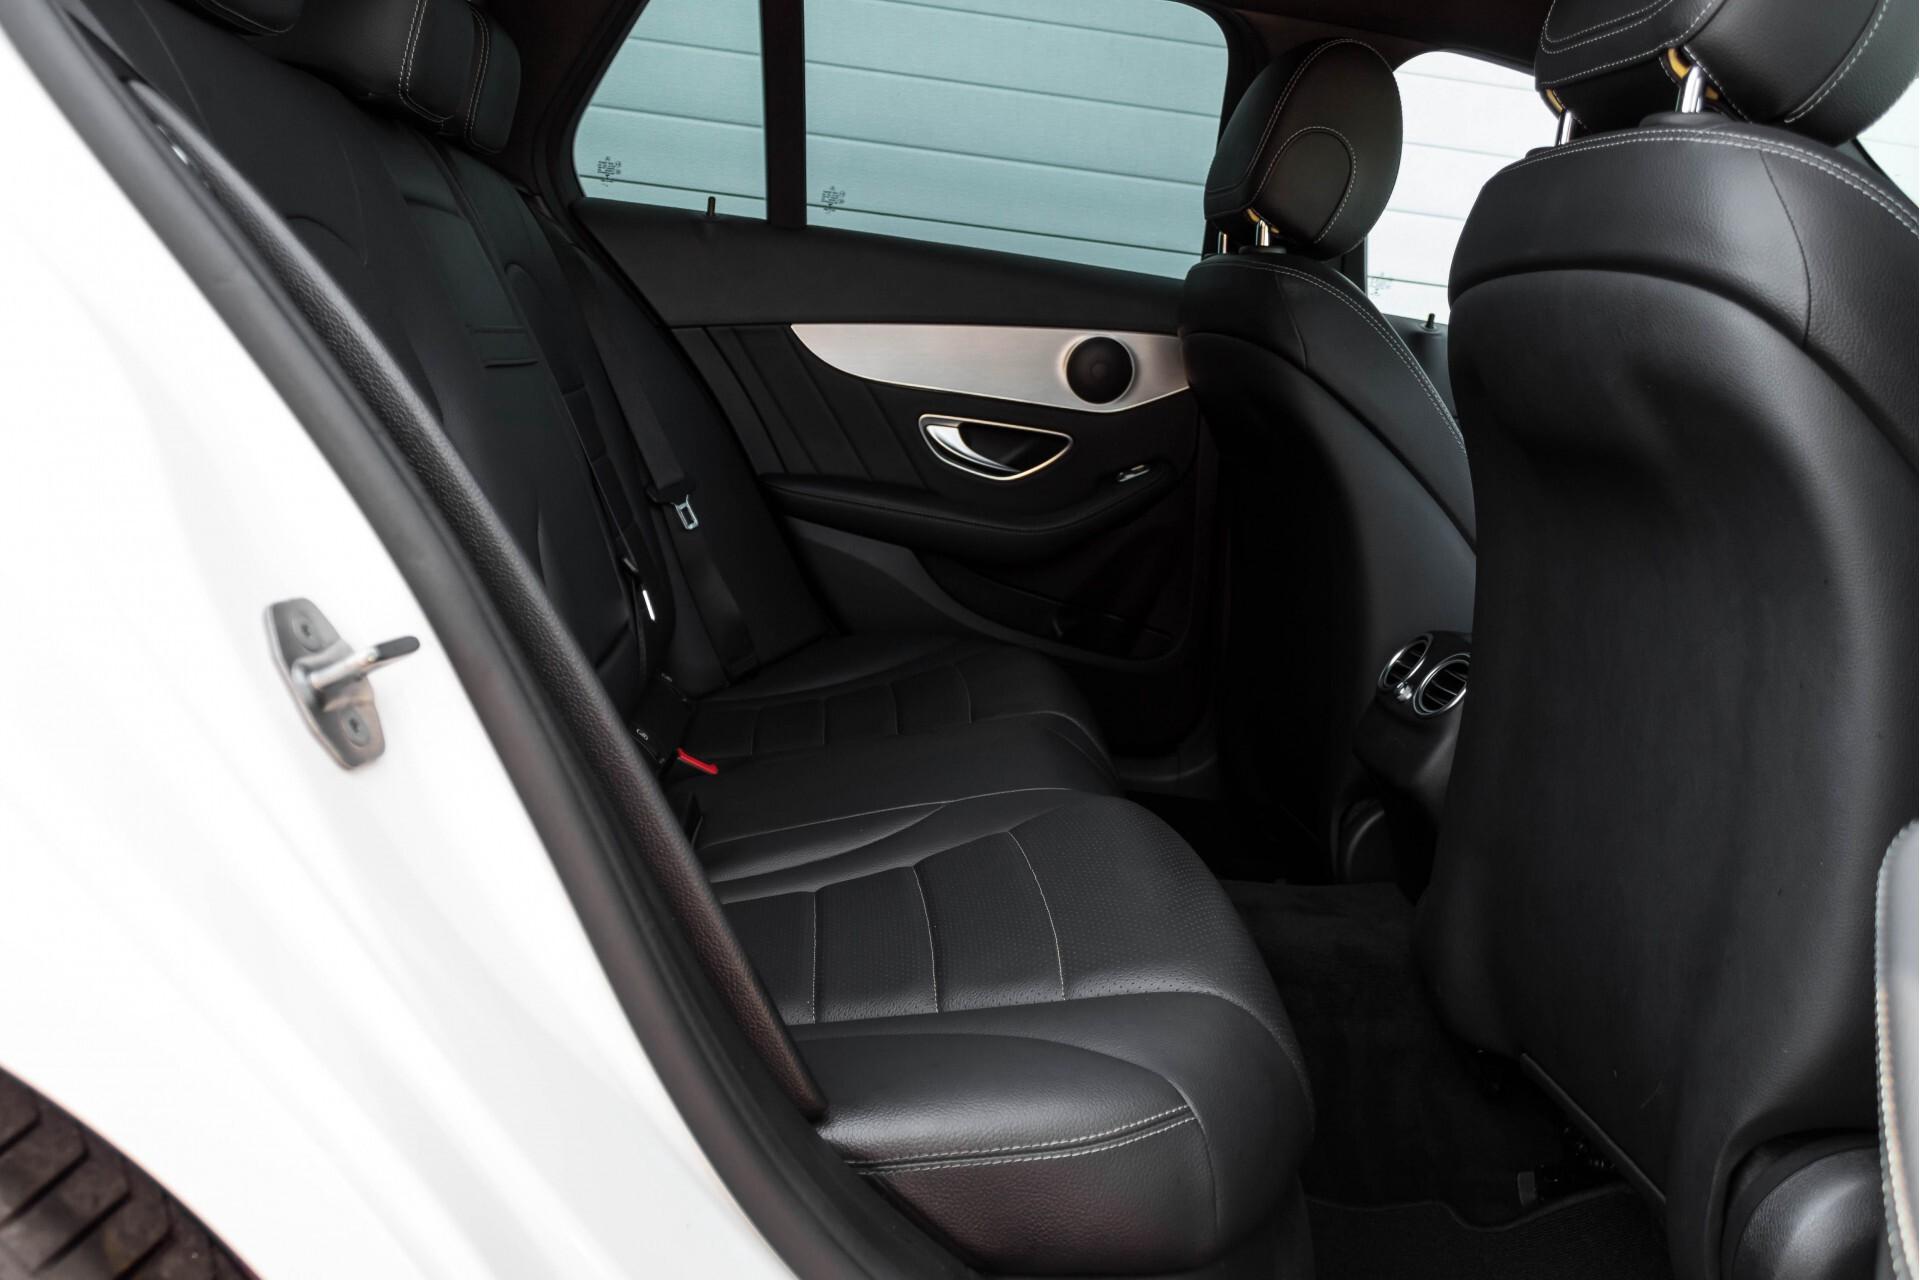 Mercedes-Benz C-Klasse Estate 200d AMG Night Wegkl-Trekhaak/LED/Dodehoekassistent/Verw Stln Aut7 Foto 4